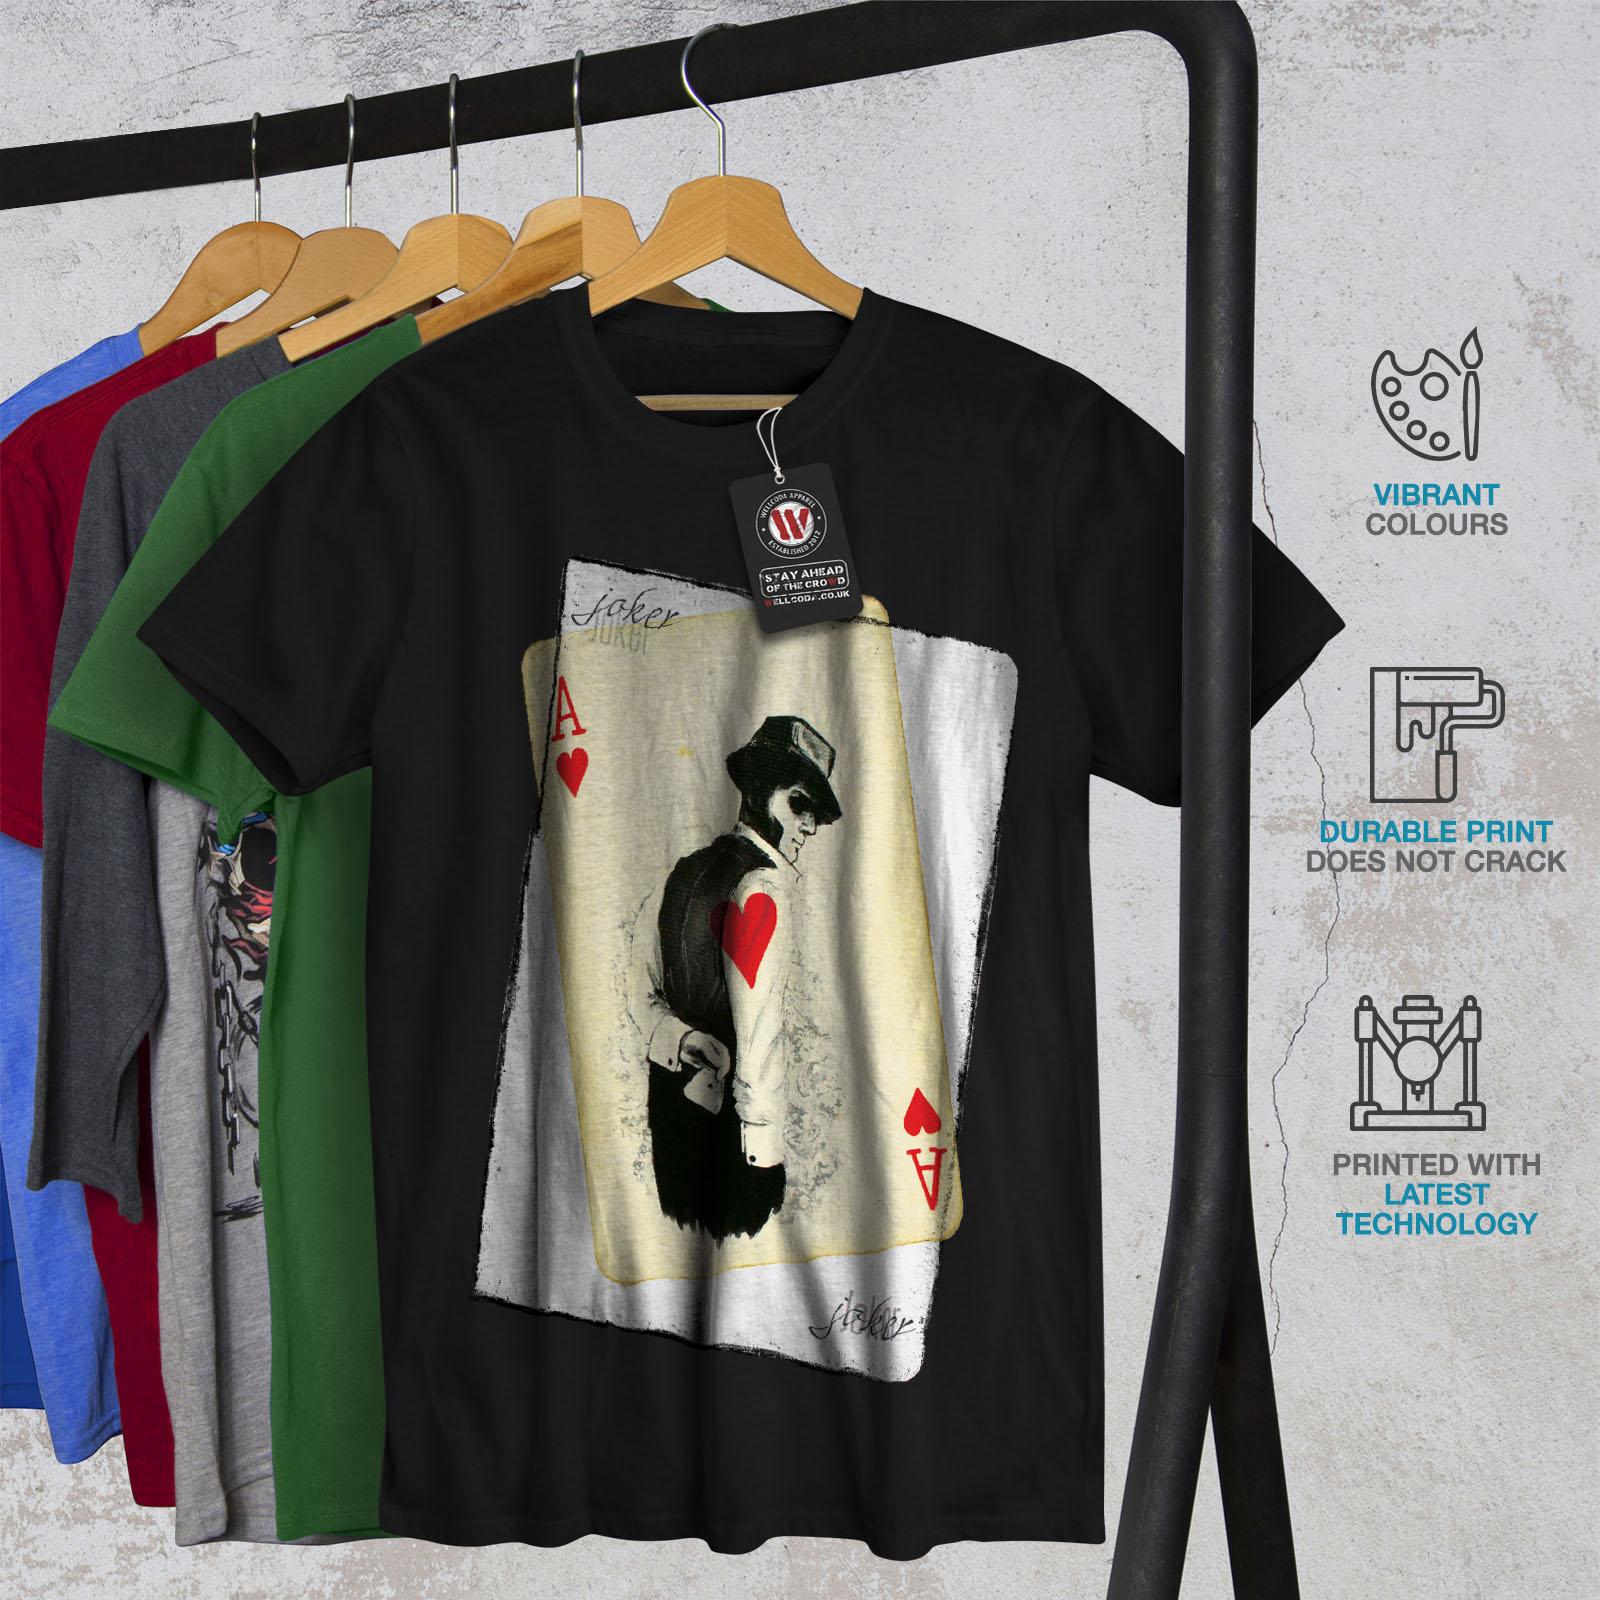 Wellcoda-POKER-misterioso-Da-Uomo-T-shirt-Gamble-design-grafico-stampato-T-shirt miniatura 6